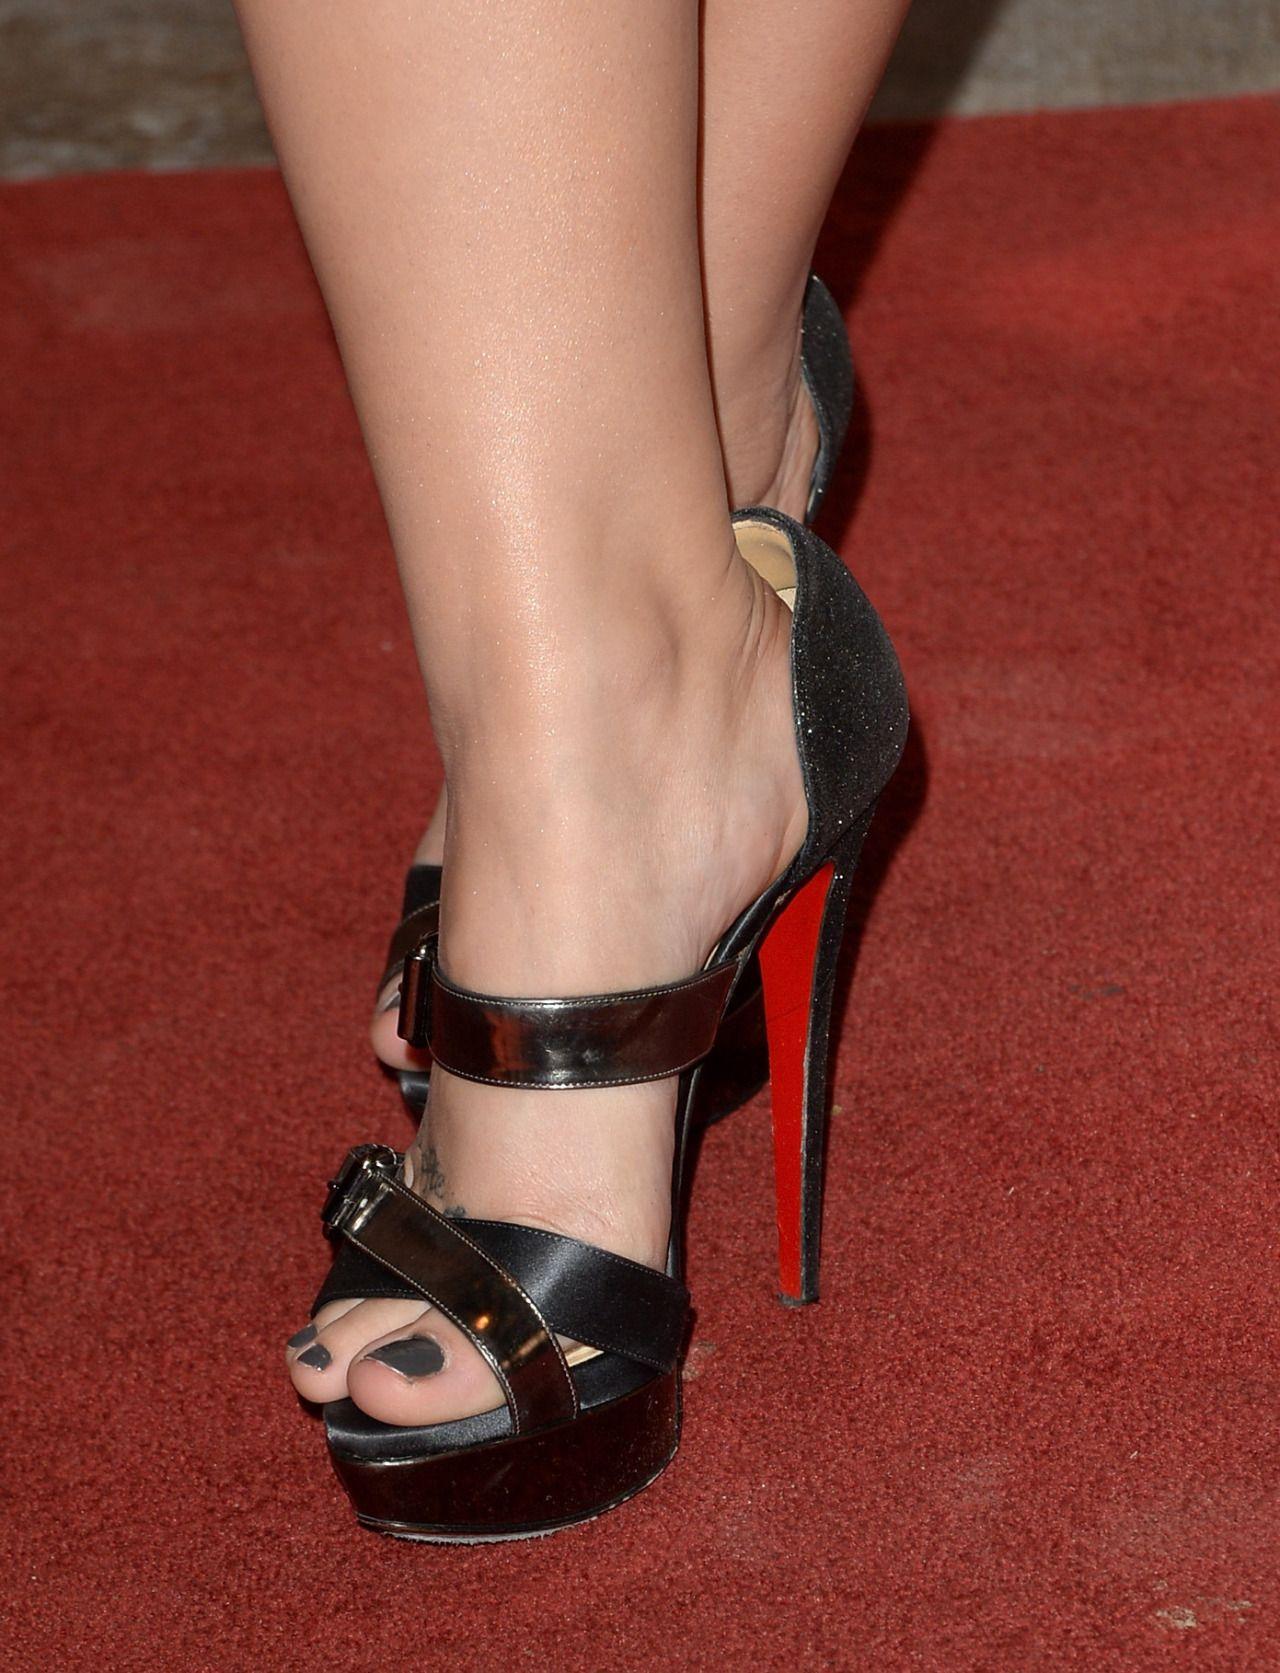 b557df5d622 Only Stiletto Sandals - Tumblr Photos (29). Only Stiletto Sandals - Tumblr  Photos (29) Sexy High Heels ...